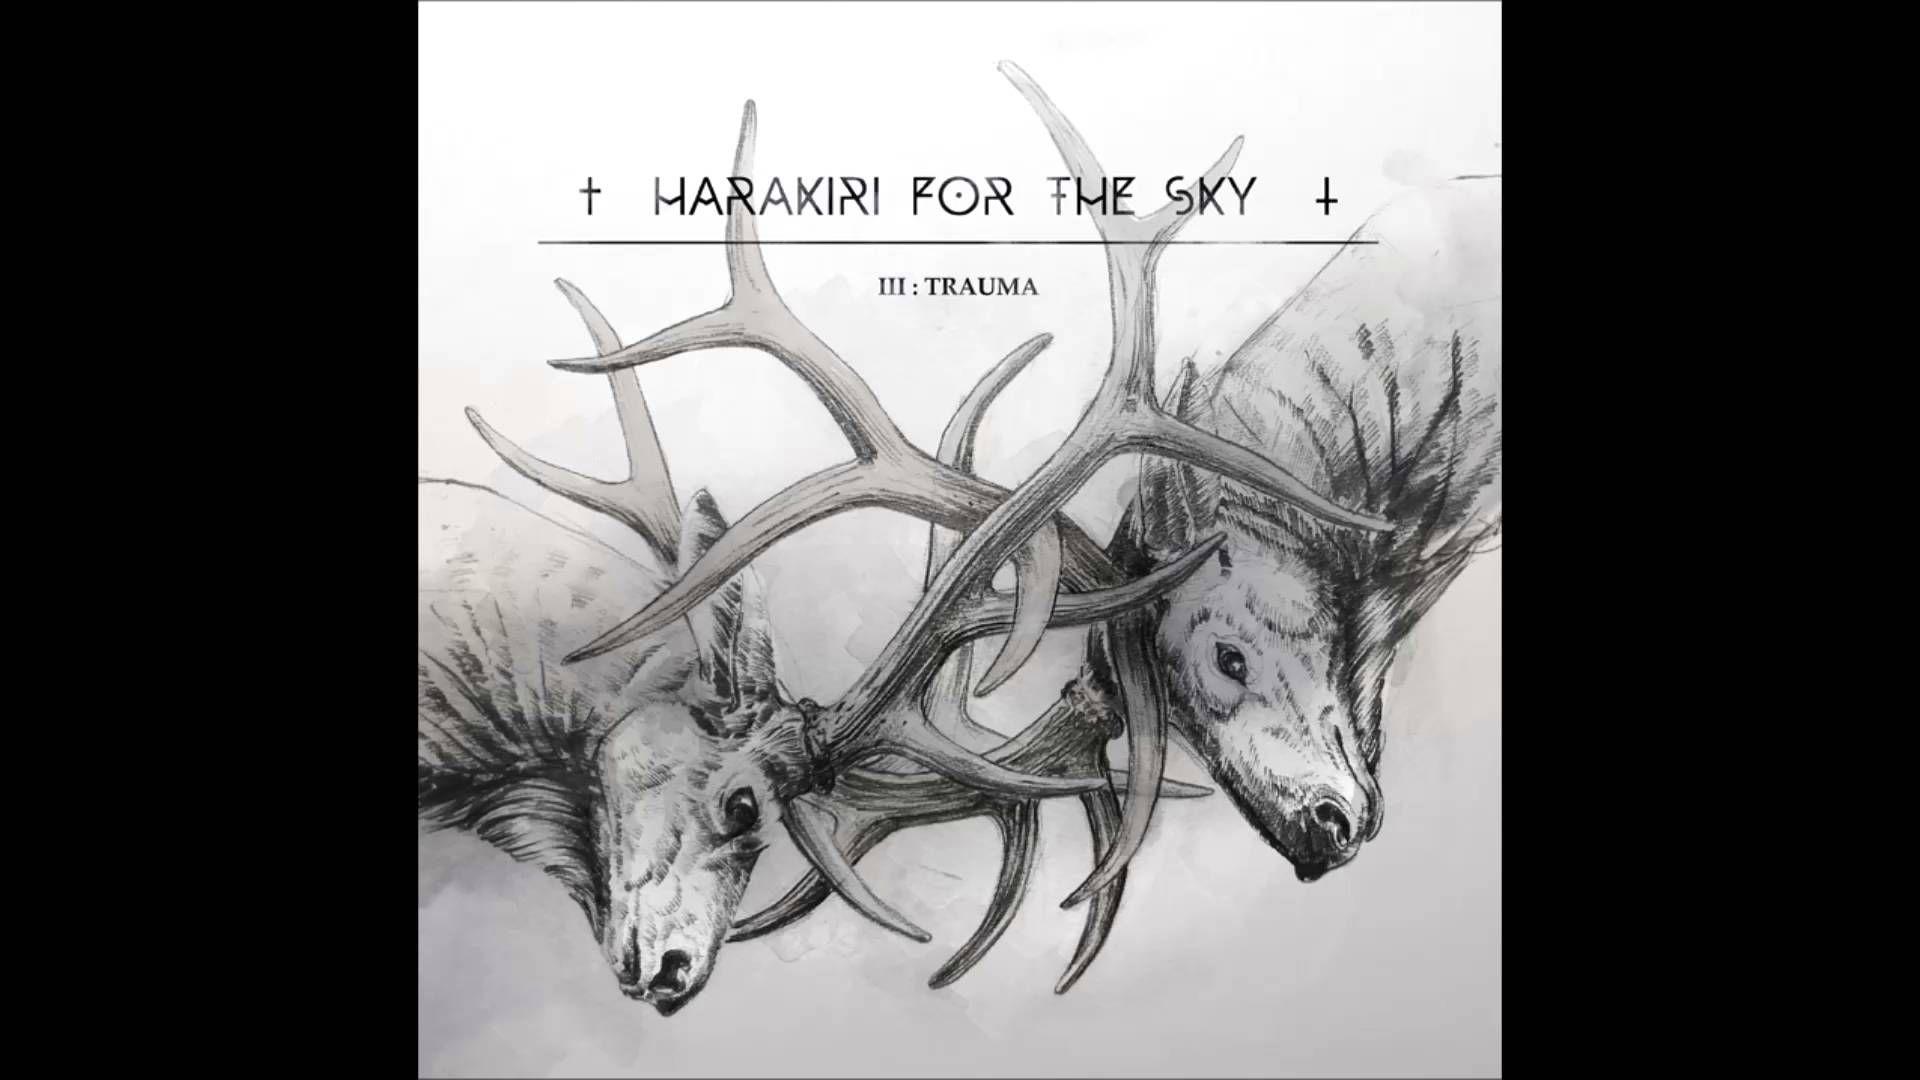 Harakiri For The Sky Calling the rain BLACK METAL